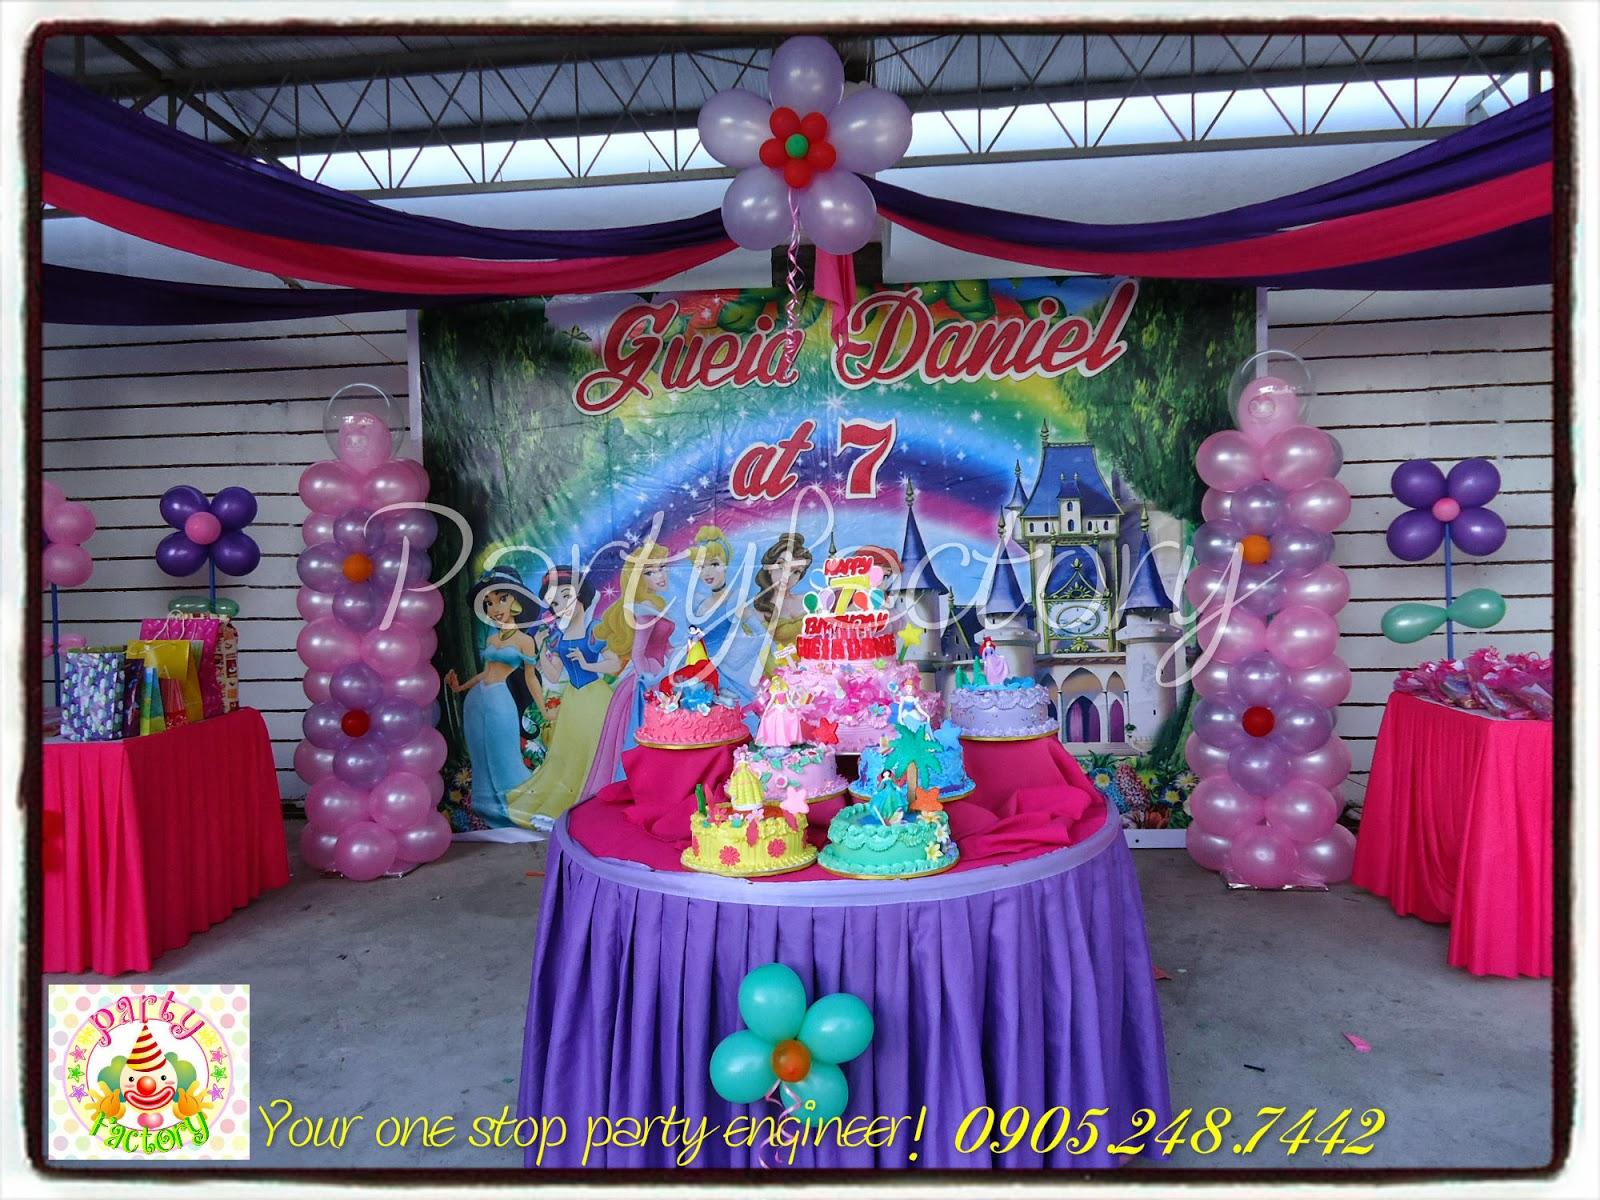 Birthday Decorations: Welcome To PartyFactory Cebu: GUEIA DANIELS' 7th BIRTHDAY